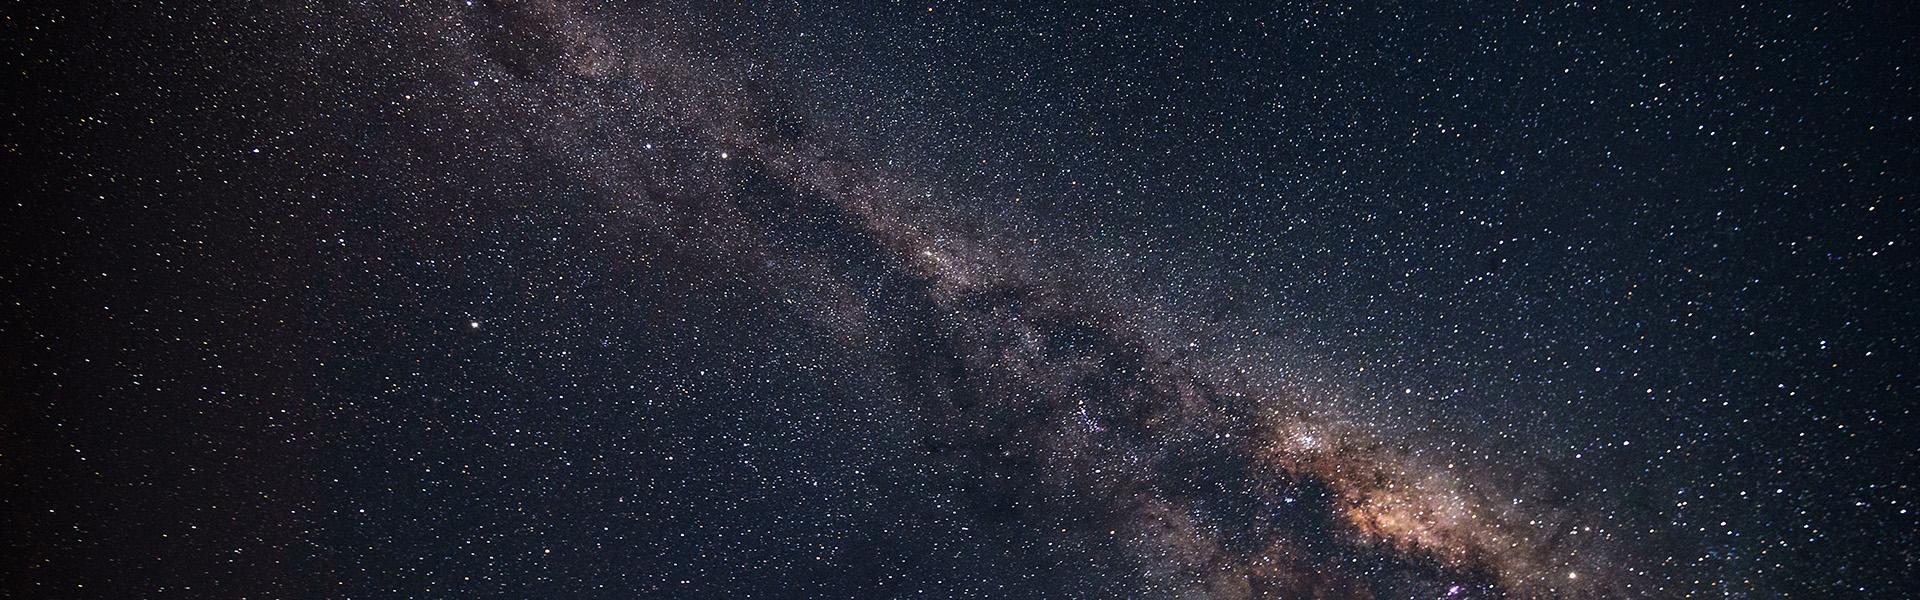 pexels-philippe-donn-night-sky-1920x600